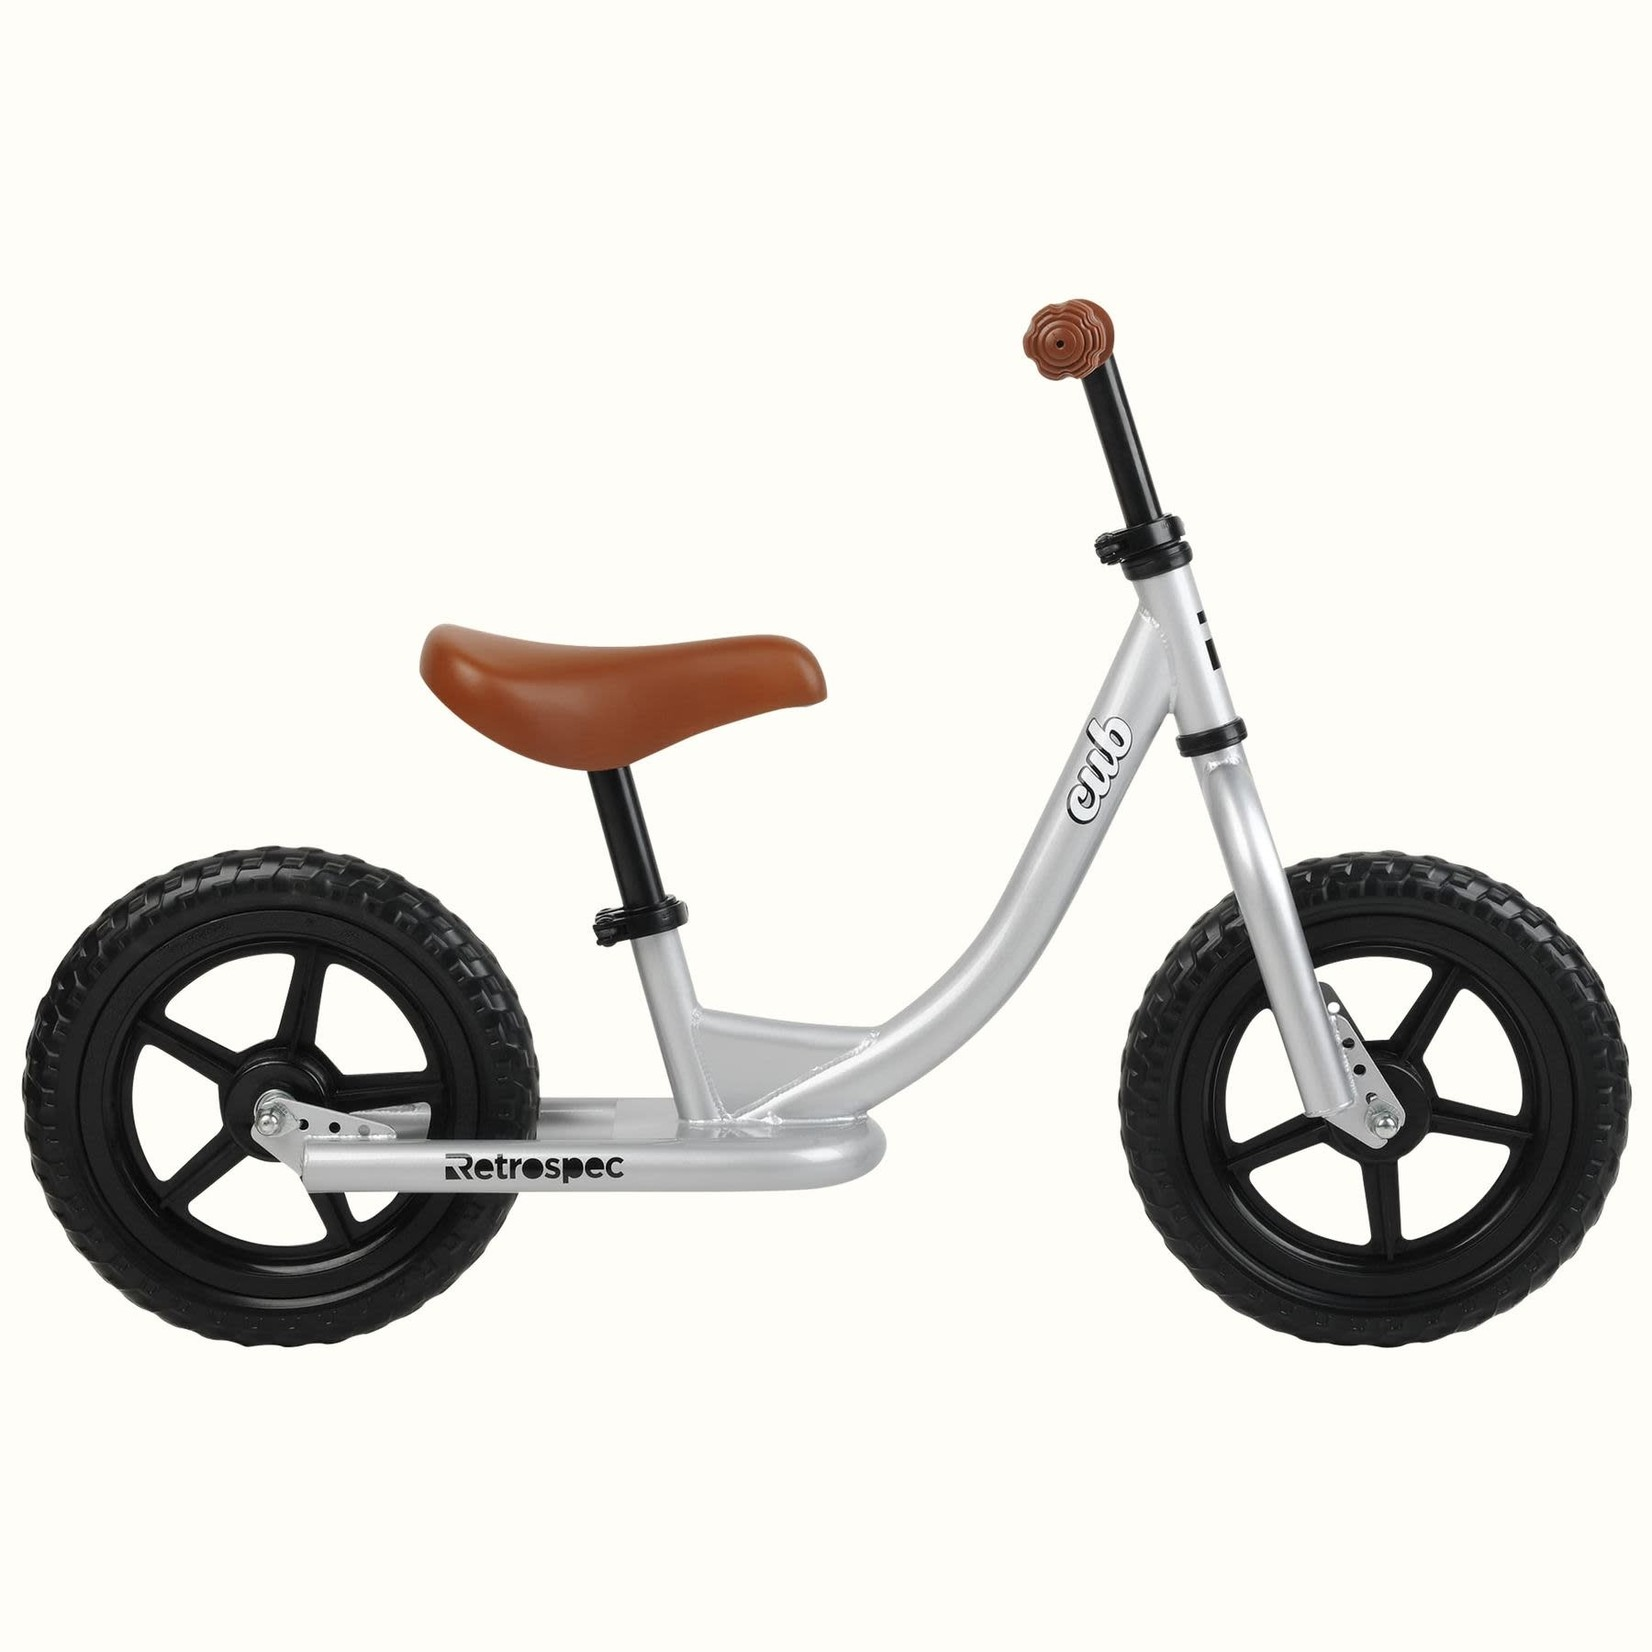 Retrospec Cub Balance Bike